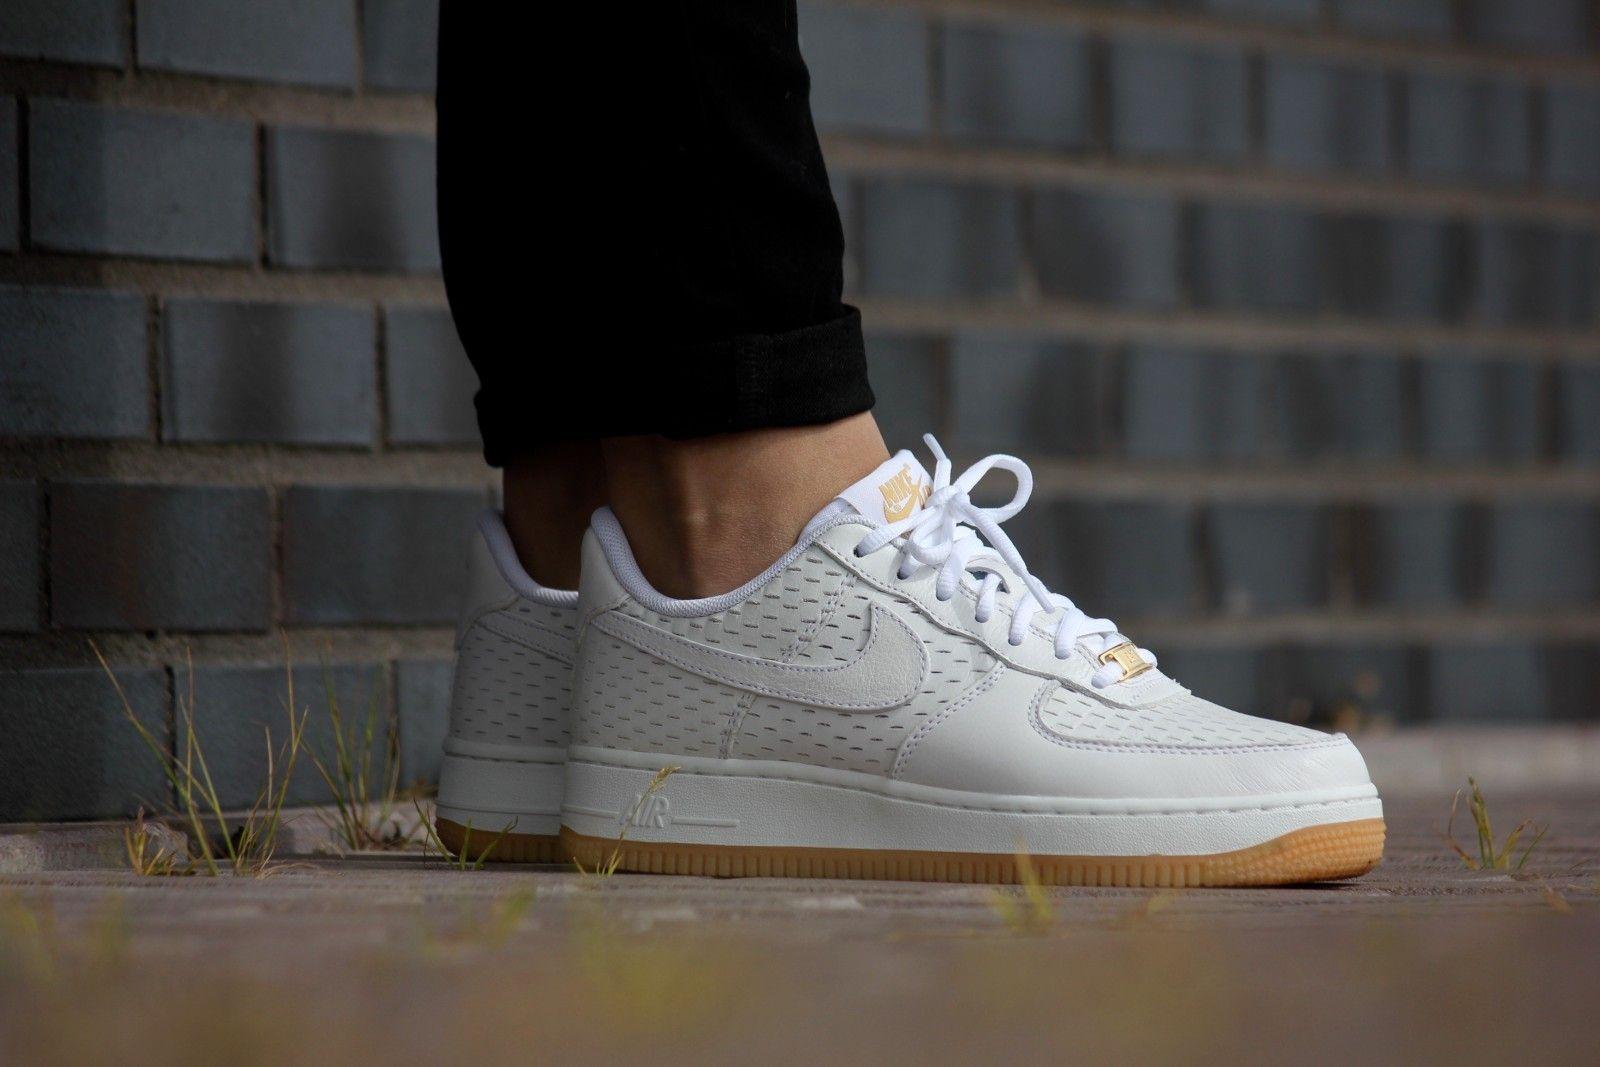 Nike Air Force 1 | Herensneakers, Nike air force, Nike